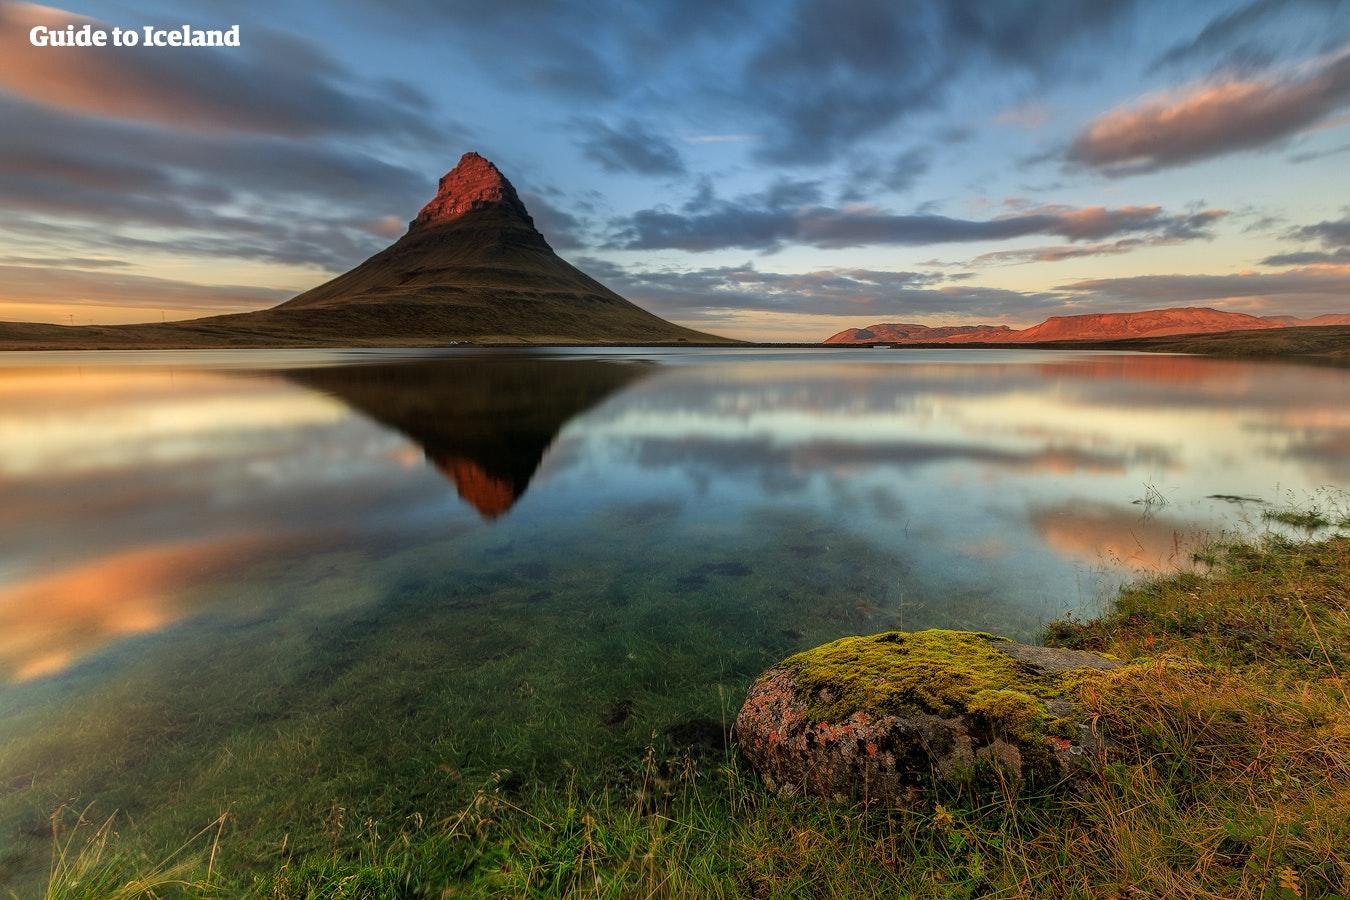 Mountain Kirkjufell at Snæfellsnes peninsula in Iceland